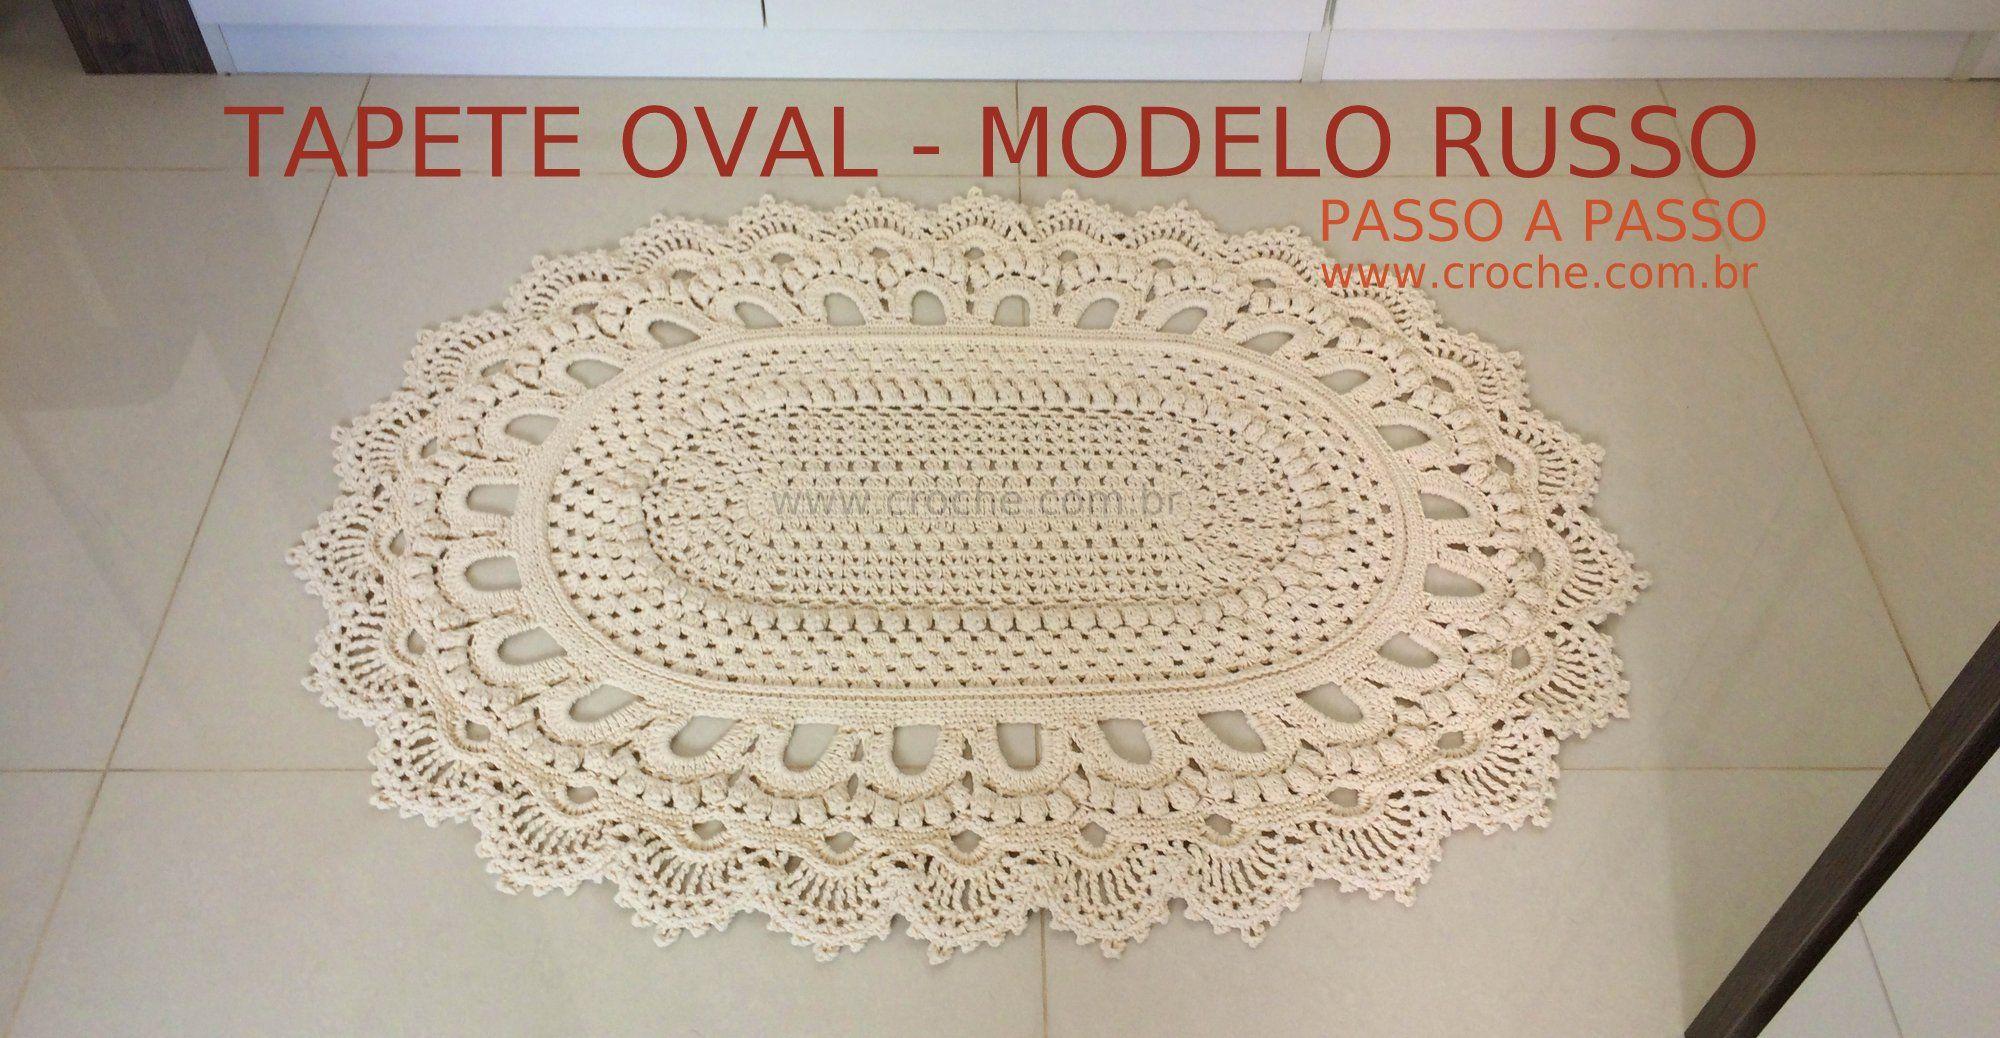 Tapete Retangular Simples Passo A Passo Google Translate Crochet  -> Tapete De Croche Oval Simples Passo A Passo